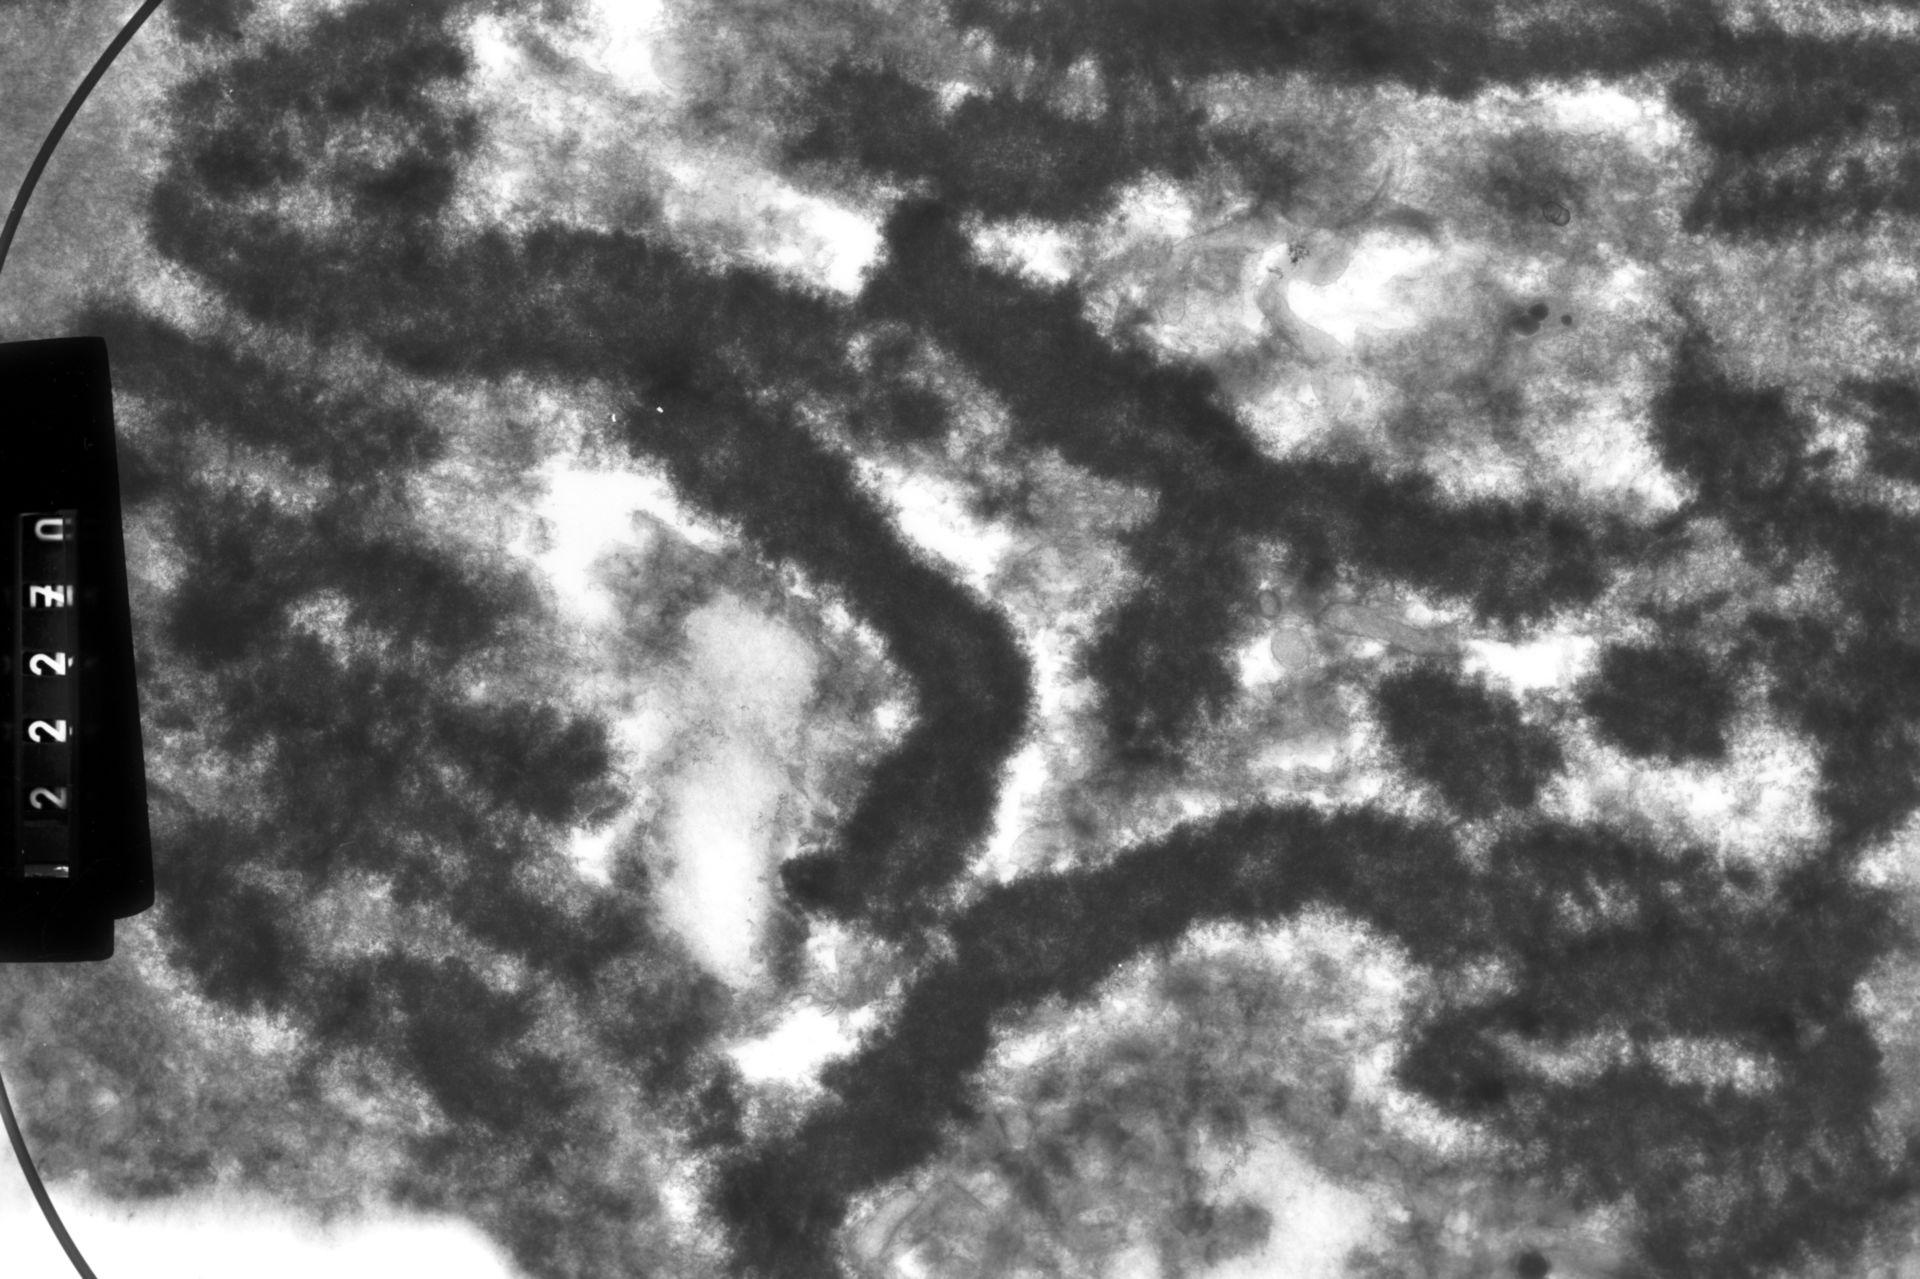 Haemanthus katharinae (Nuclear chromosome) - CIL:13192